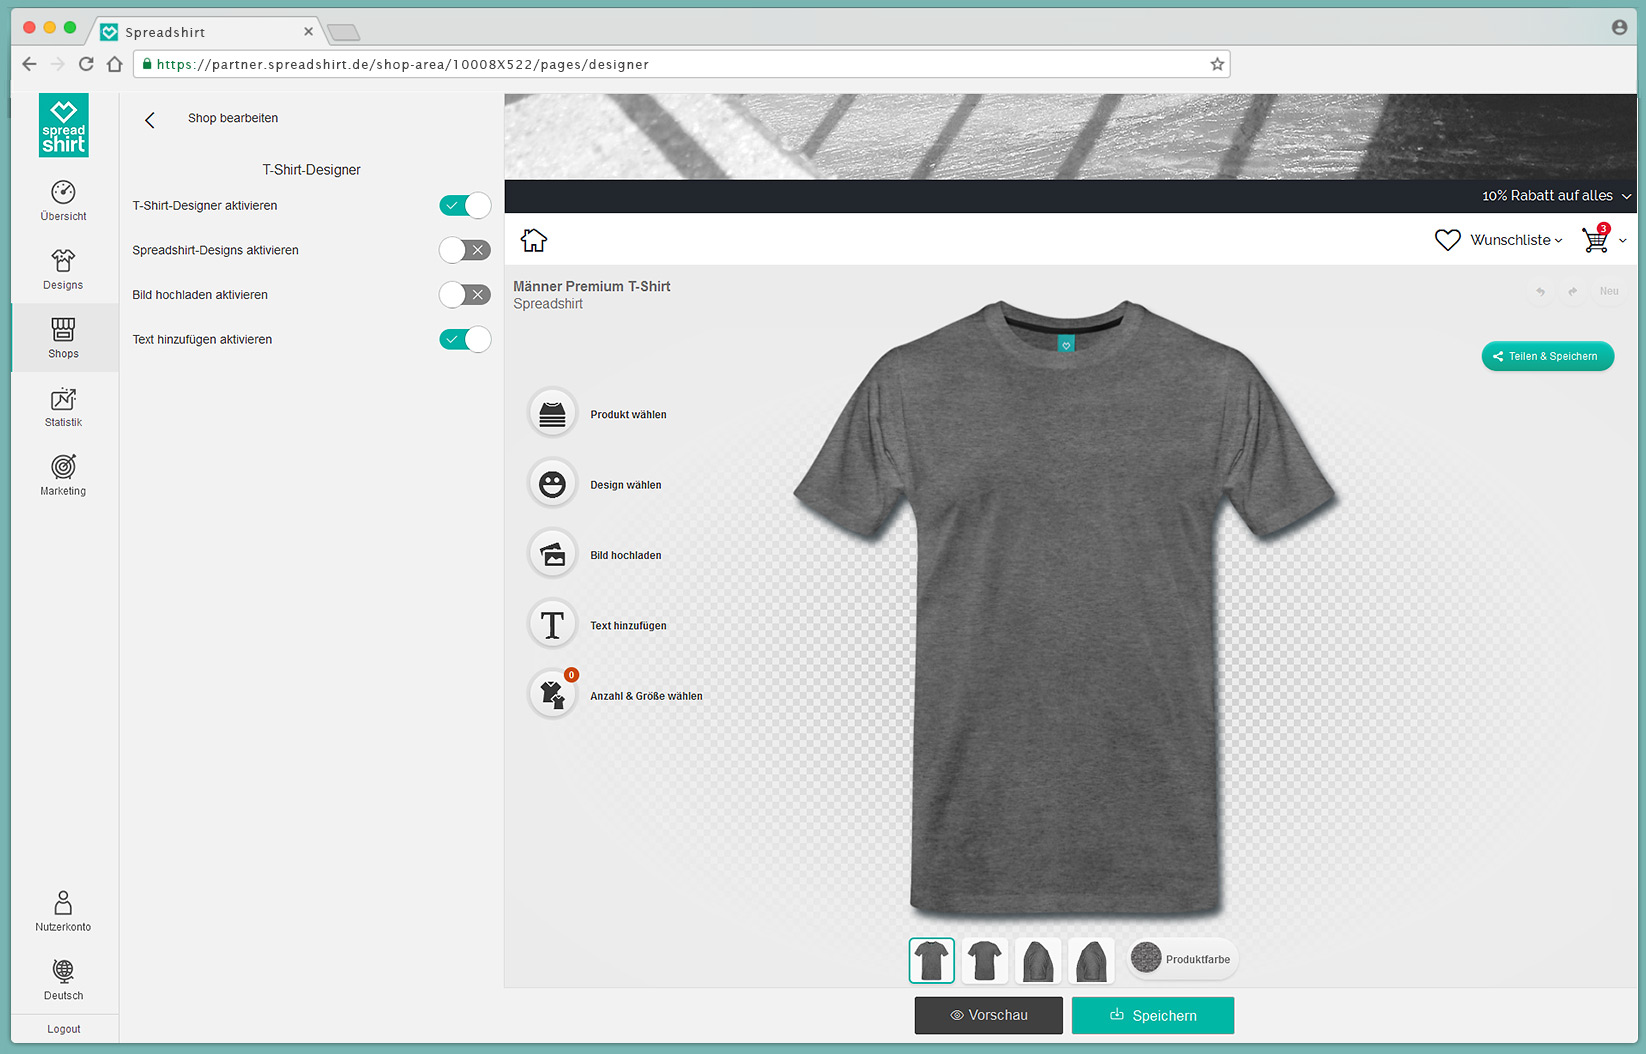 spreadshop binde den t shirt designer ein. Black Bedroom Furniture Sets. Home Design Ideas